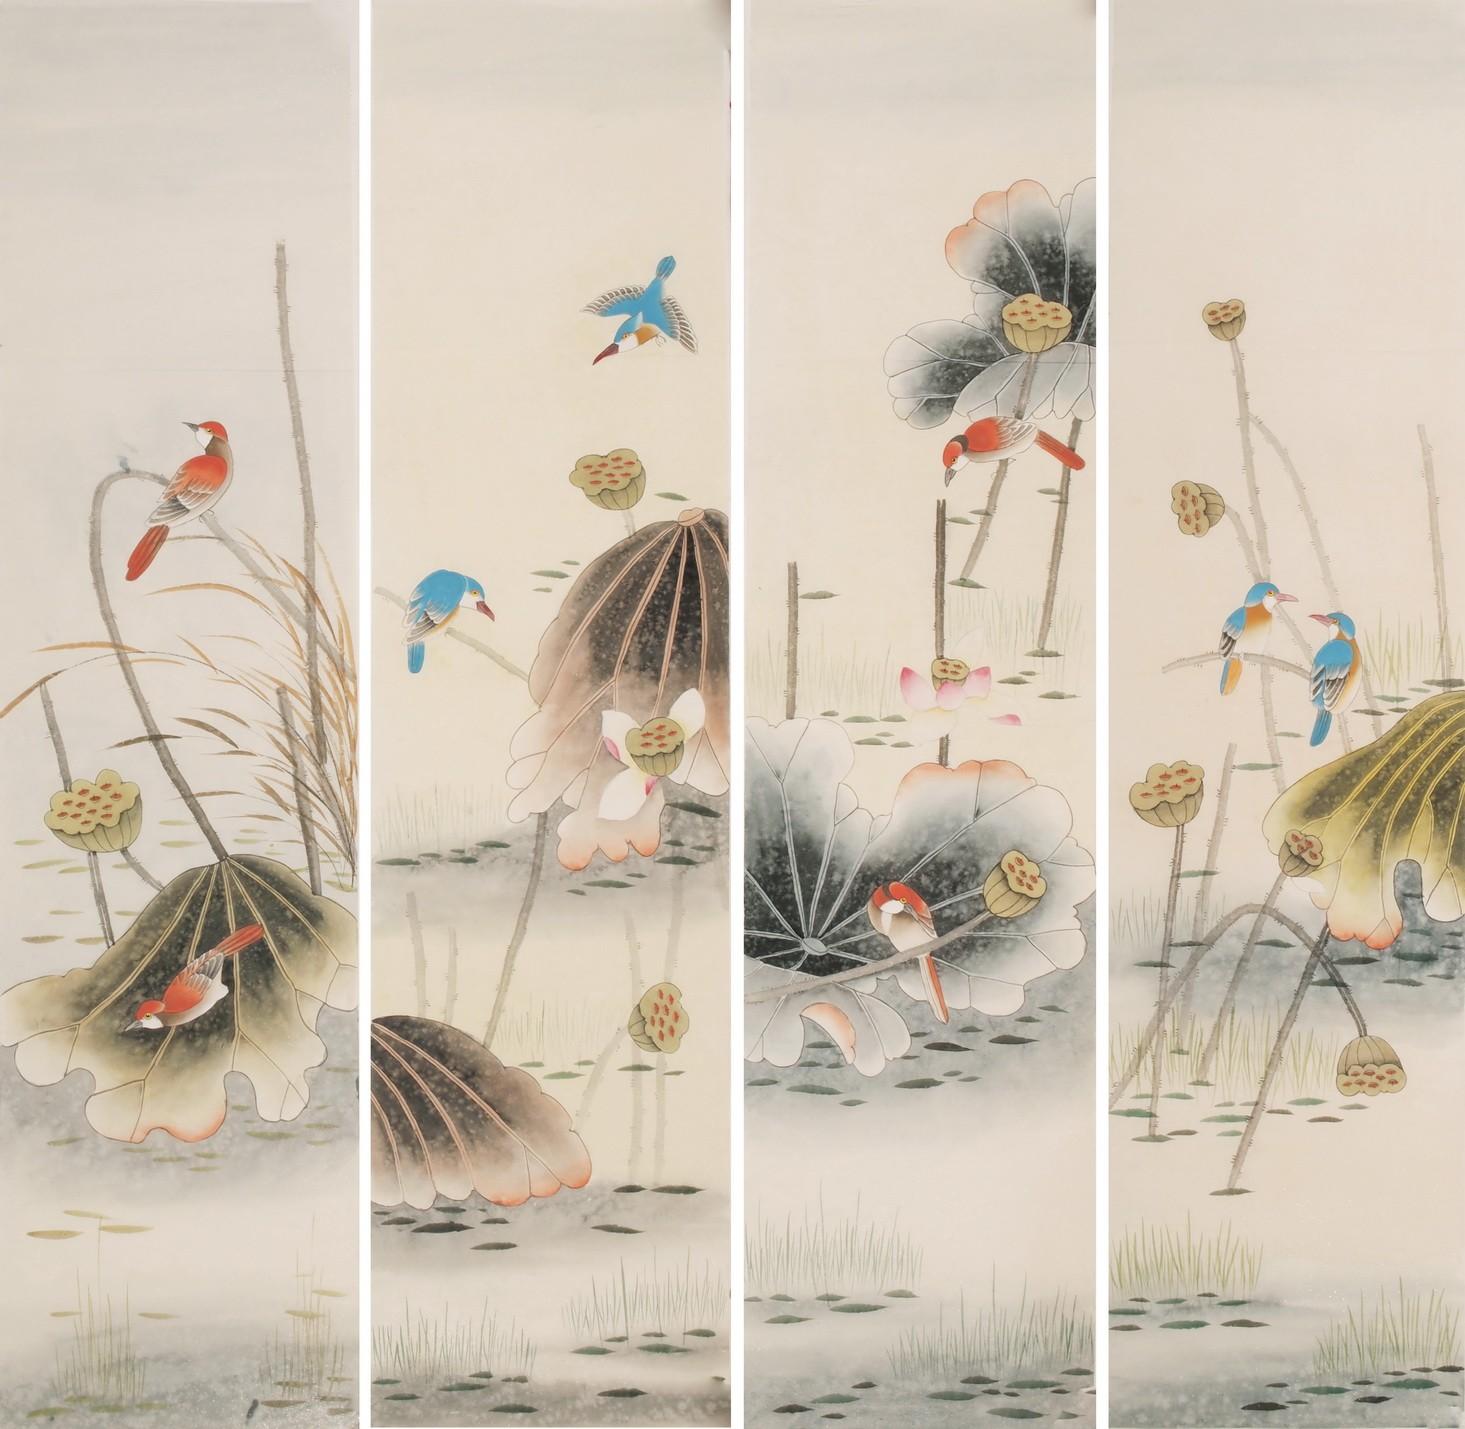 Kingfisher - CNAG001277